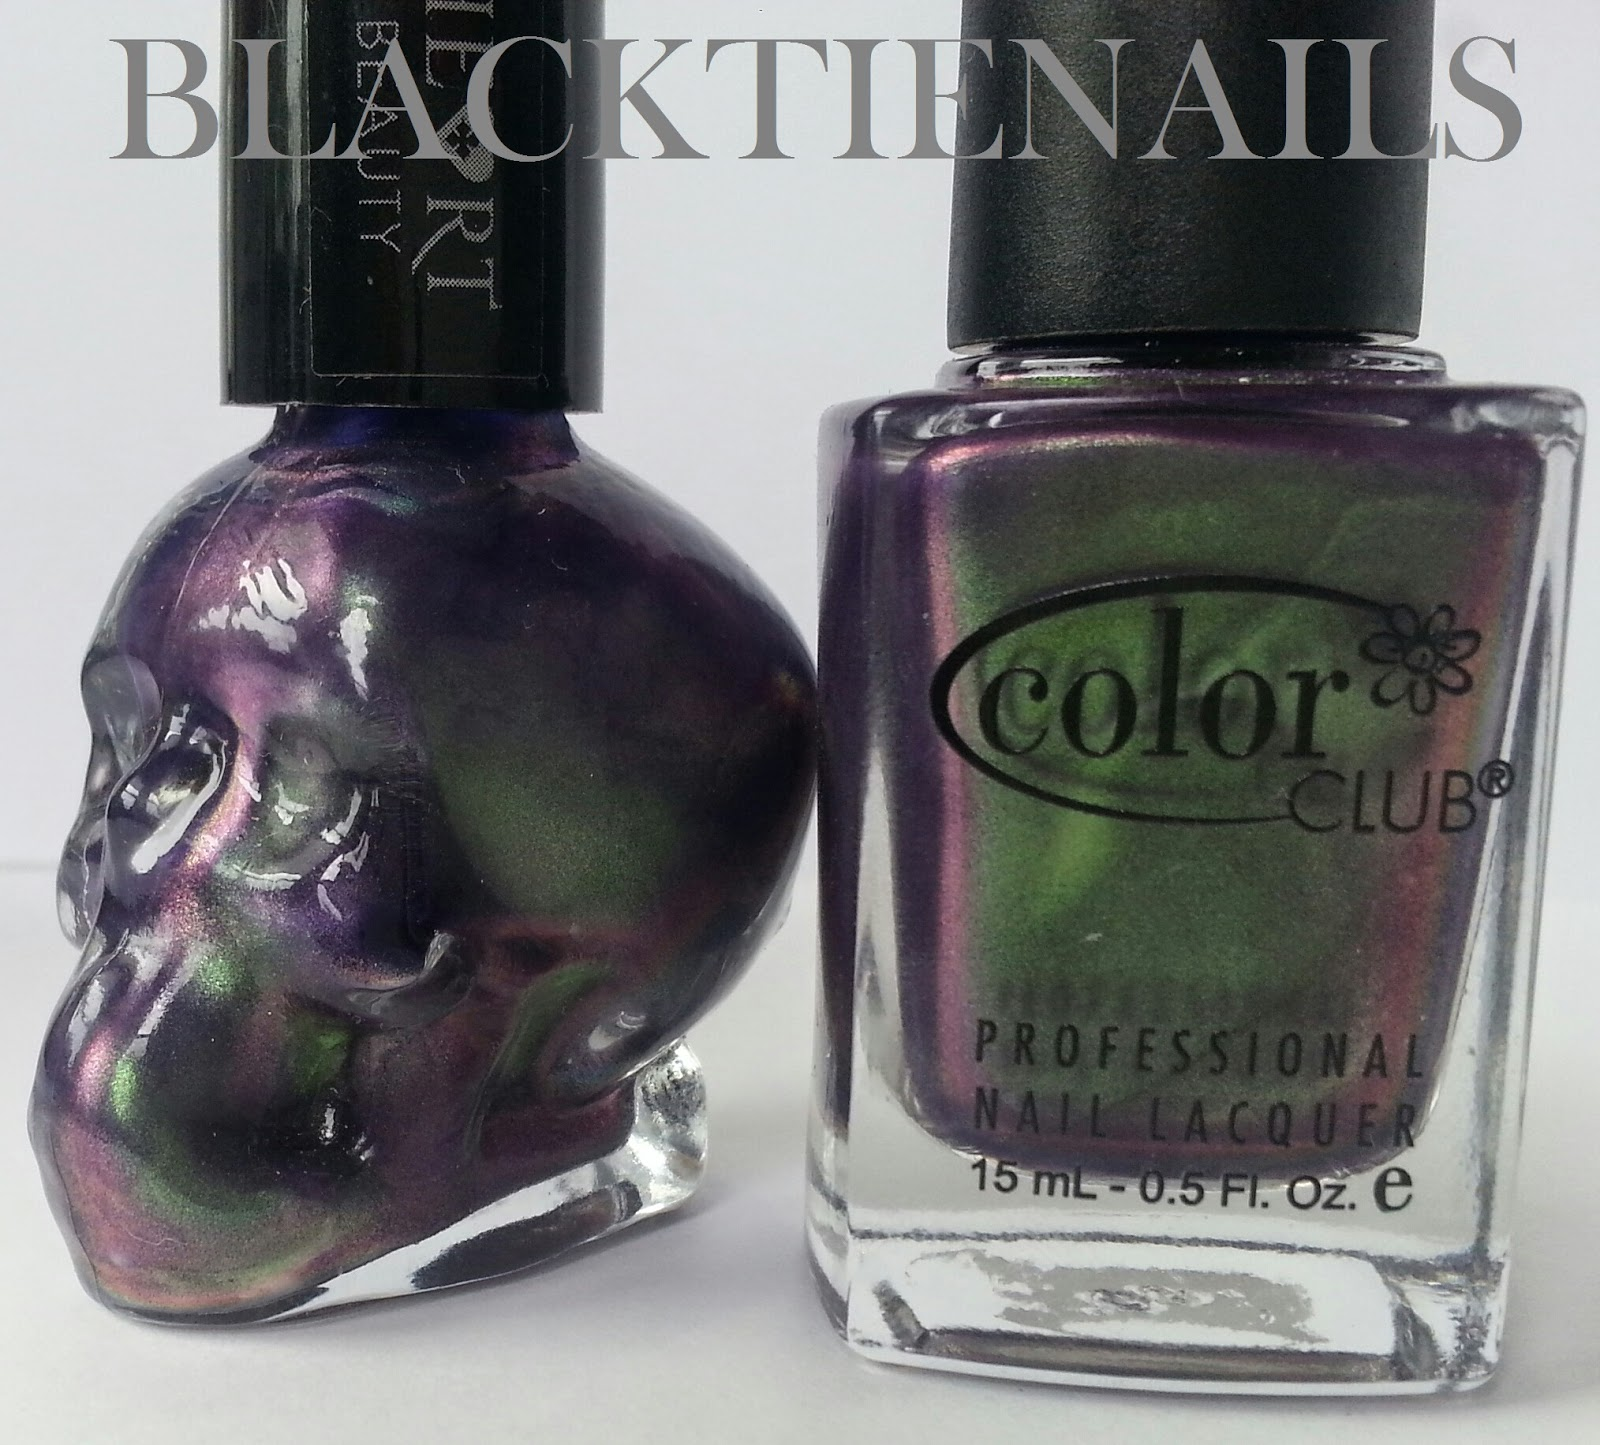 Black Tie Nails Blackheart Beauty Nail Polish Swatches And Comparison Part 2